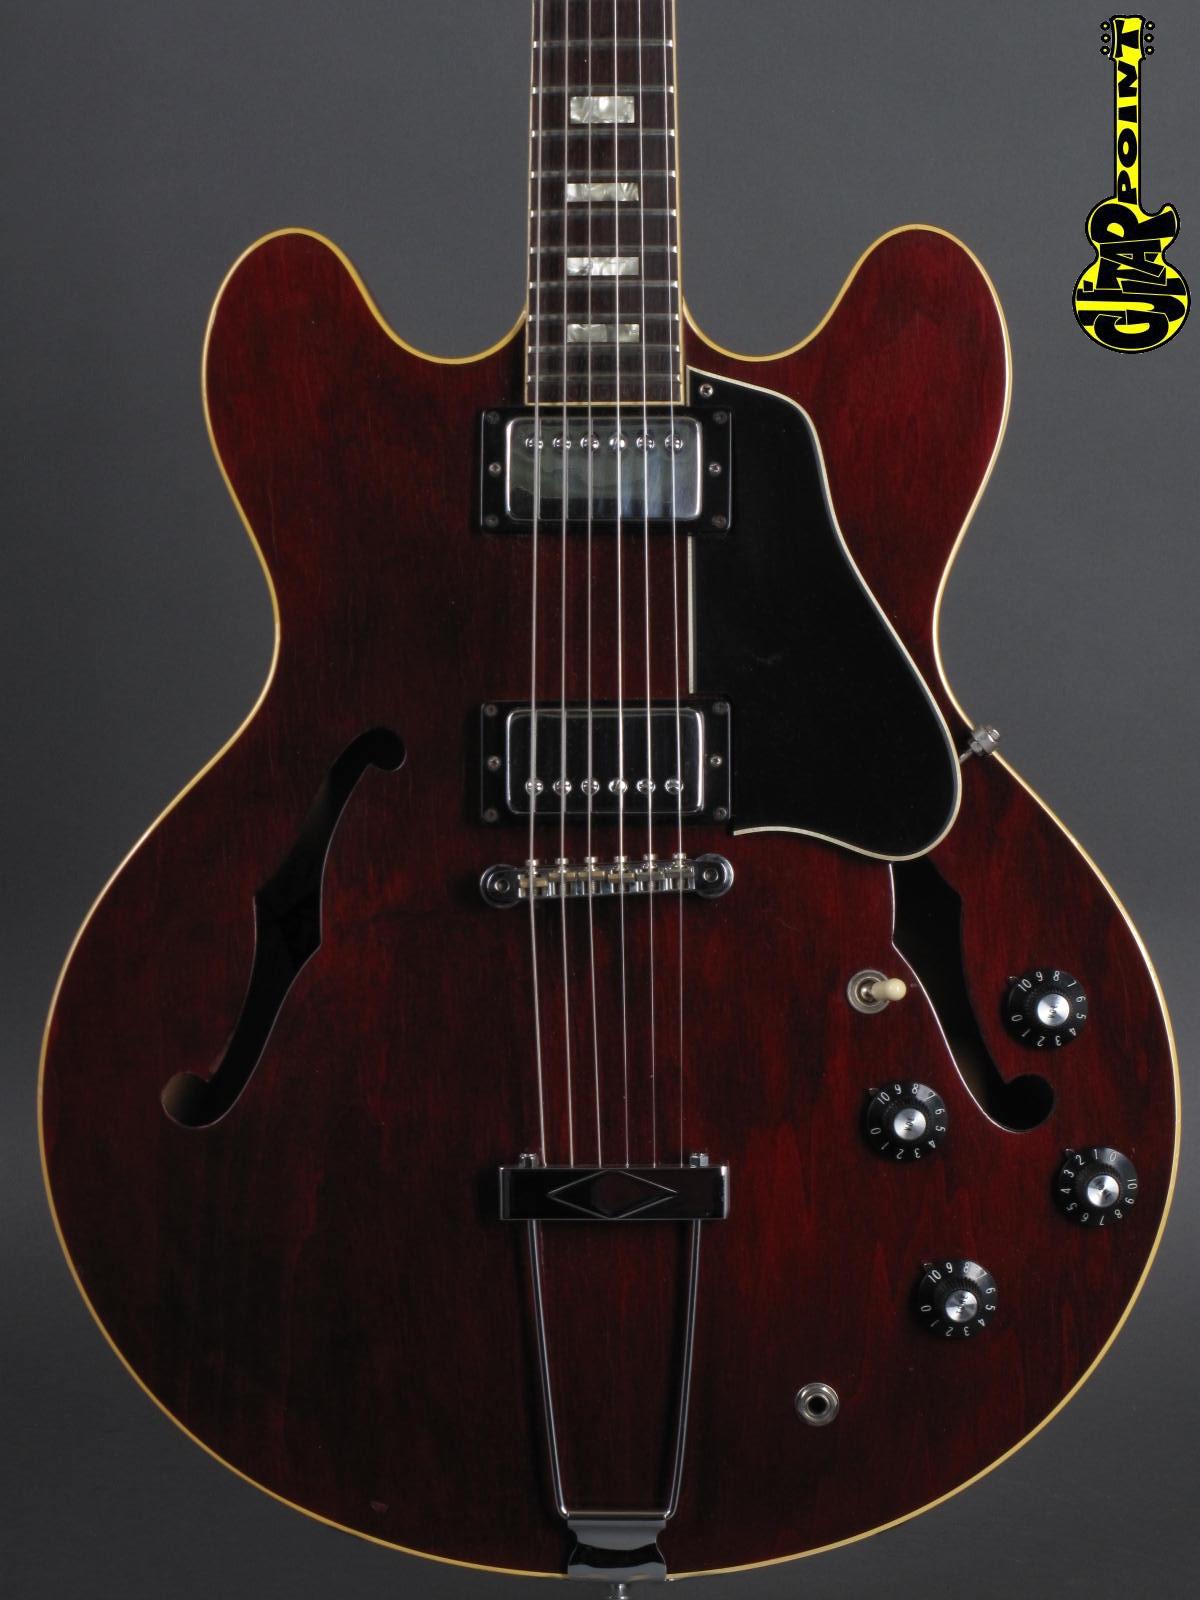 1975 Gibson ES-335 TD - Winered